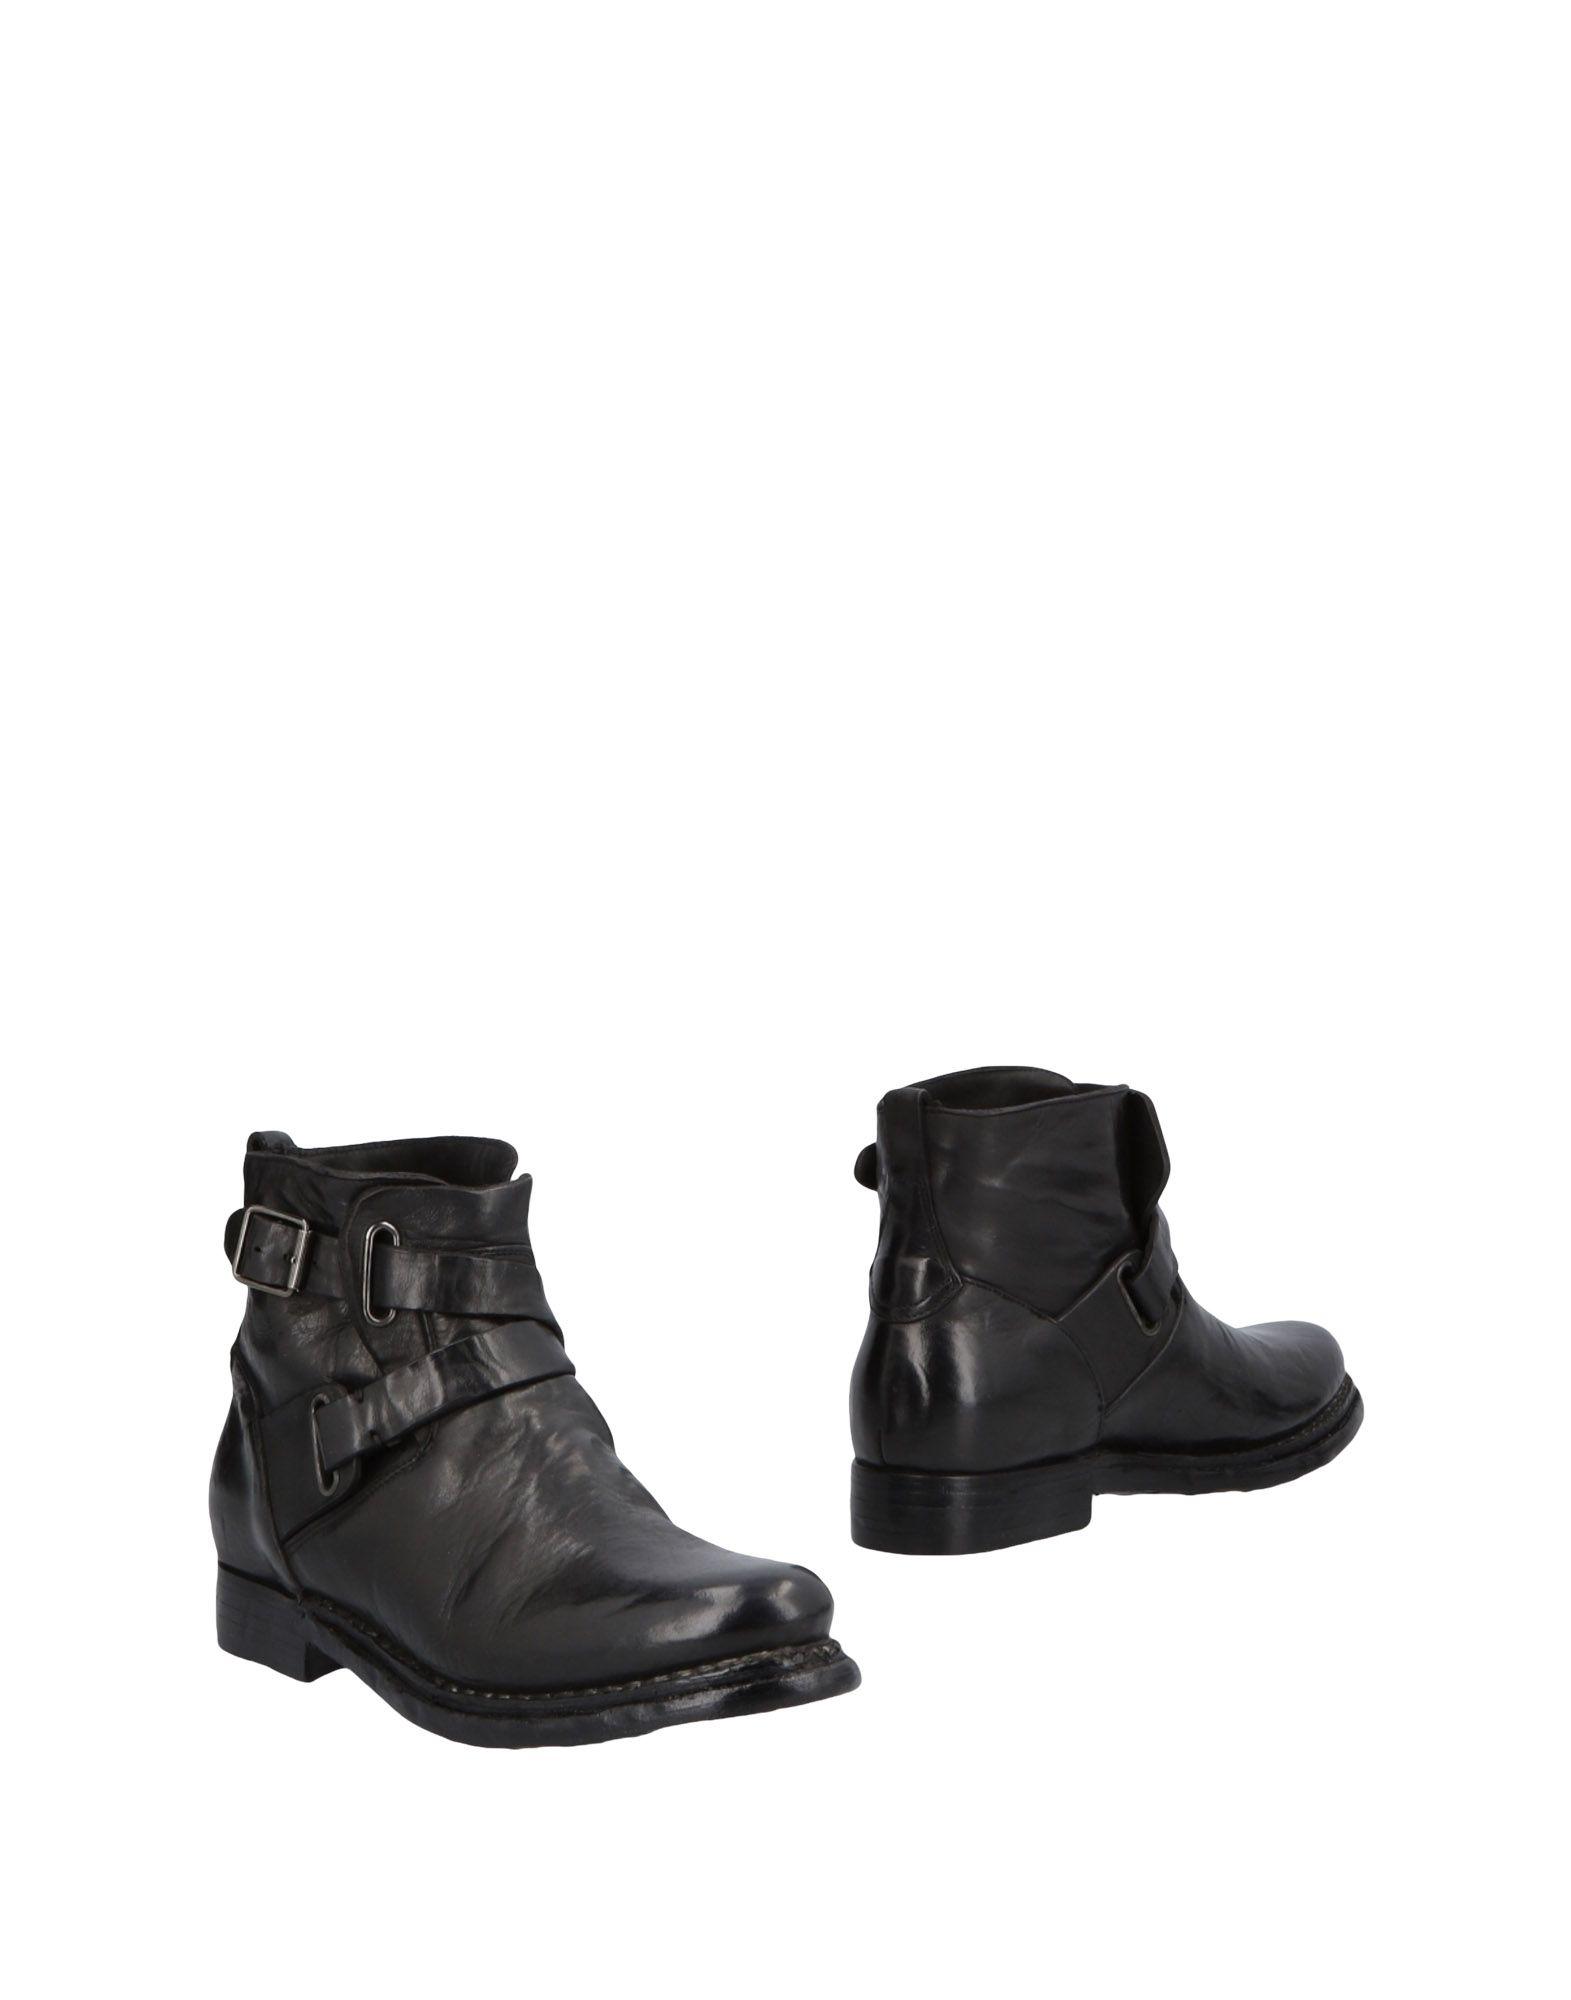 Silvano Sassetti Ankle Boot - Boots Women Silvano Sassetti Ankle Boots - online on  Canada - 11494808TO 3cc260